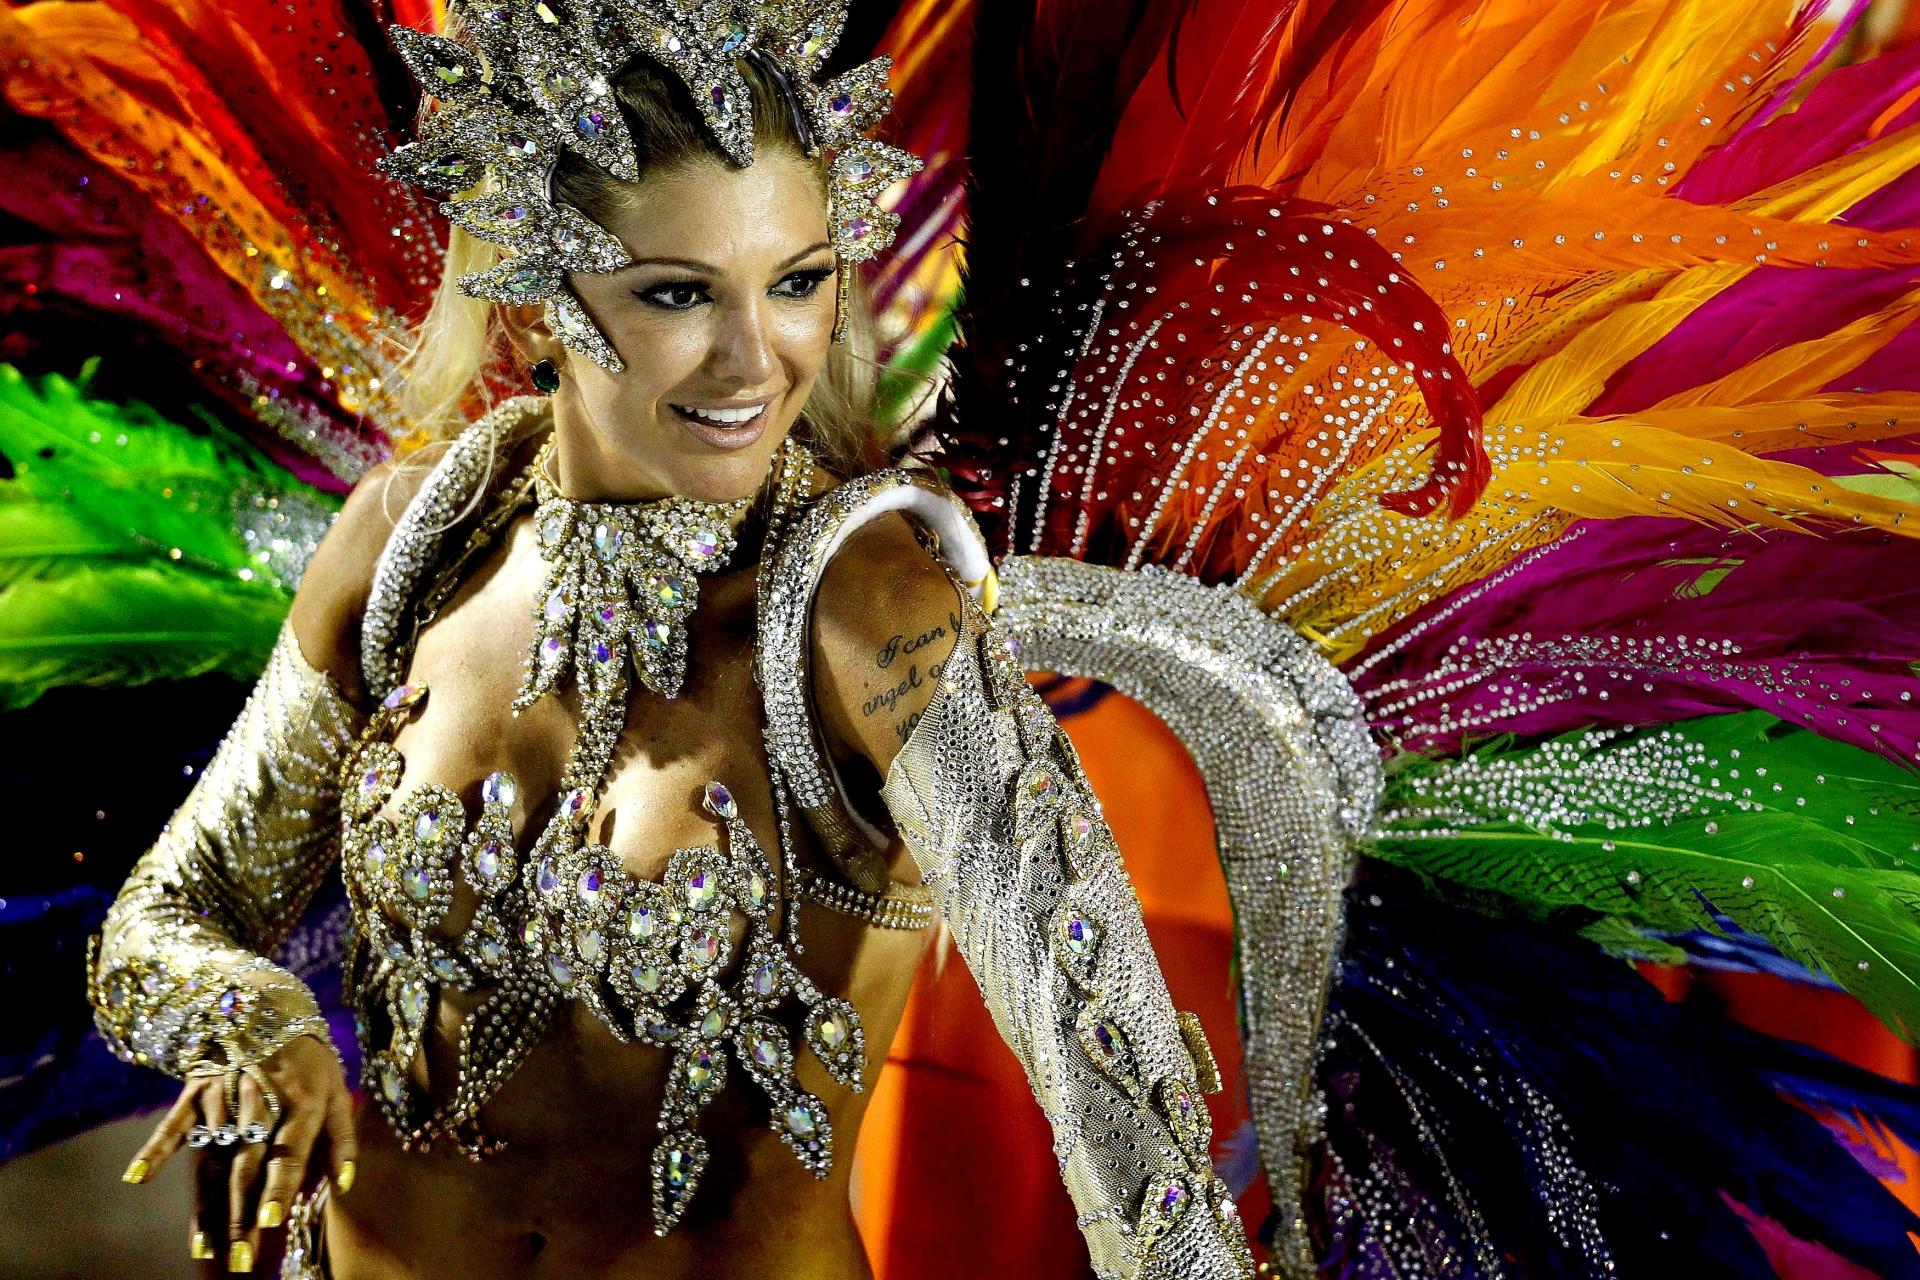 Colourful Rio Carnival at El Patio Restaurant of Melia Hanoi Hotel